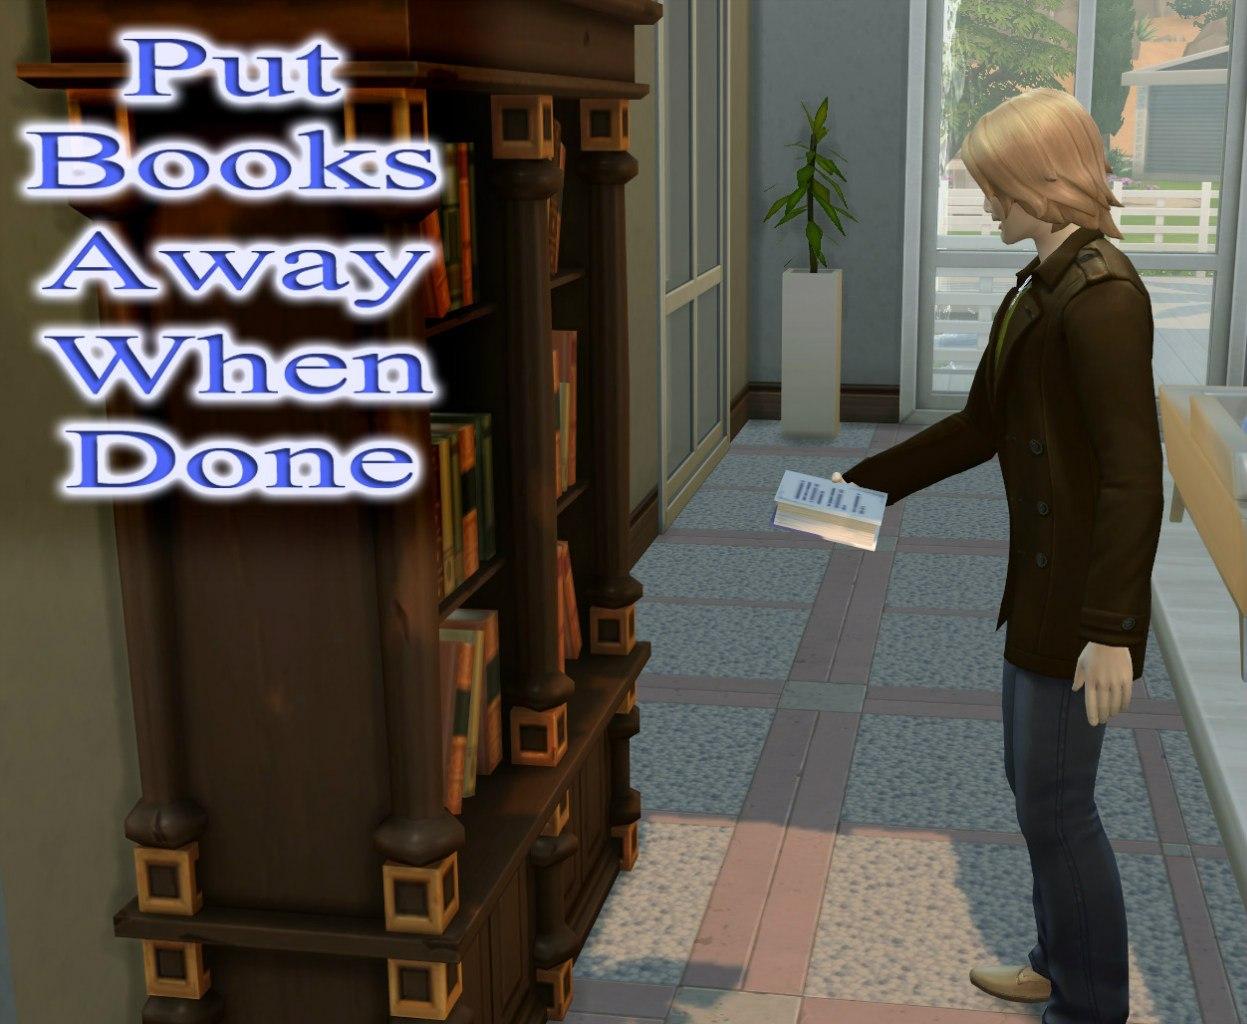 Автоматически ложить книги на место после прочтения